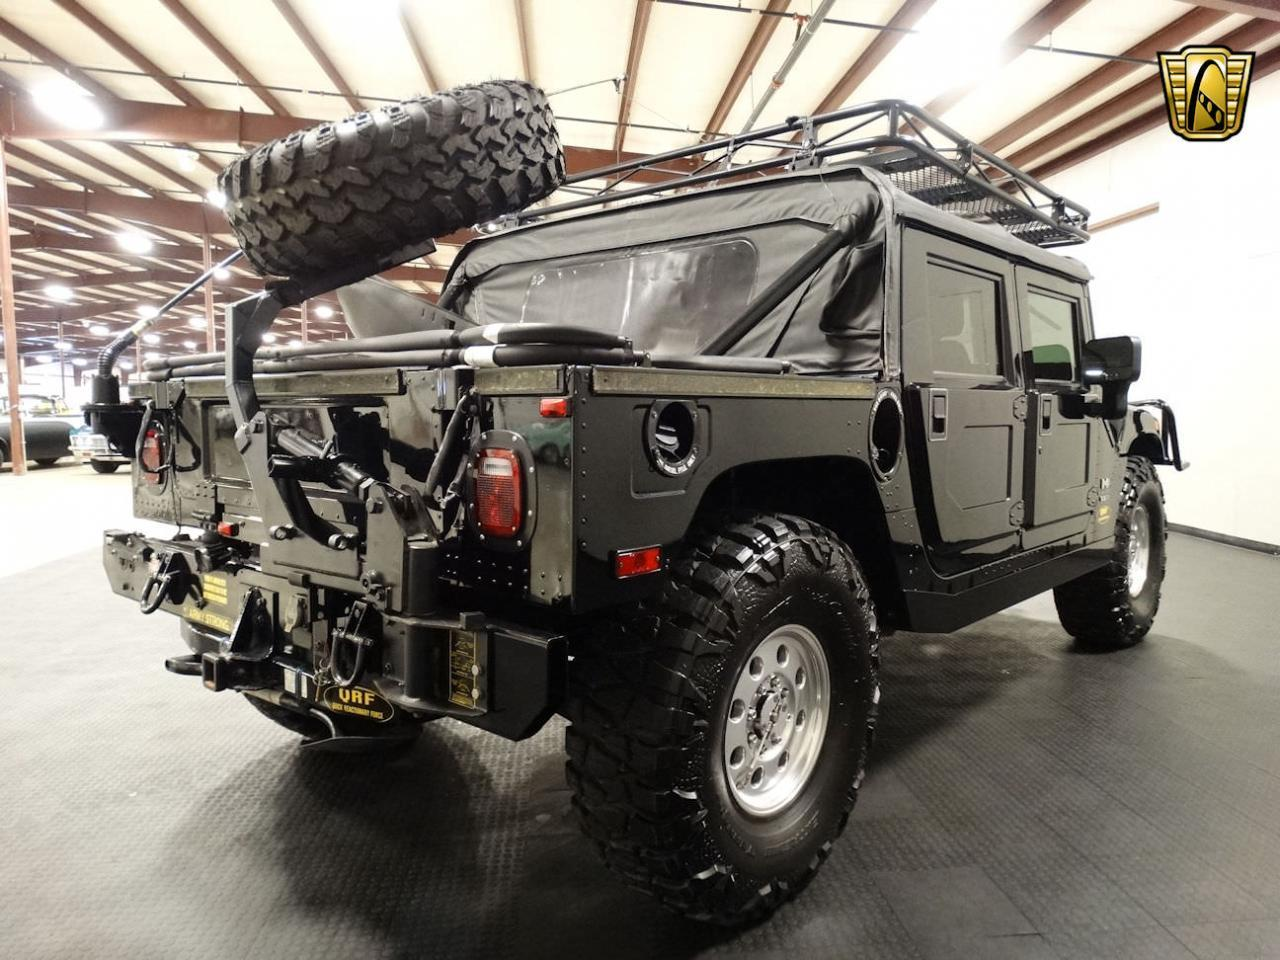 2002 Hummer H1 for Sale | ClassicCars.com | CC-984821